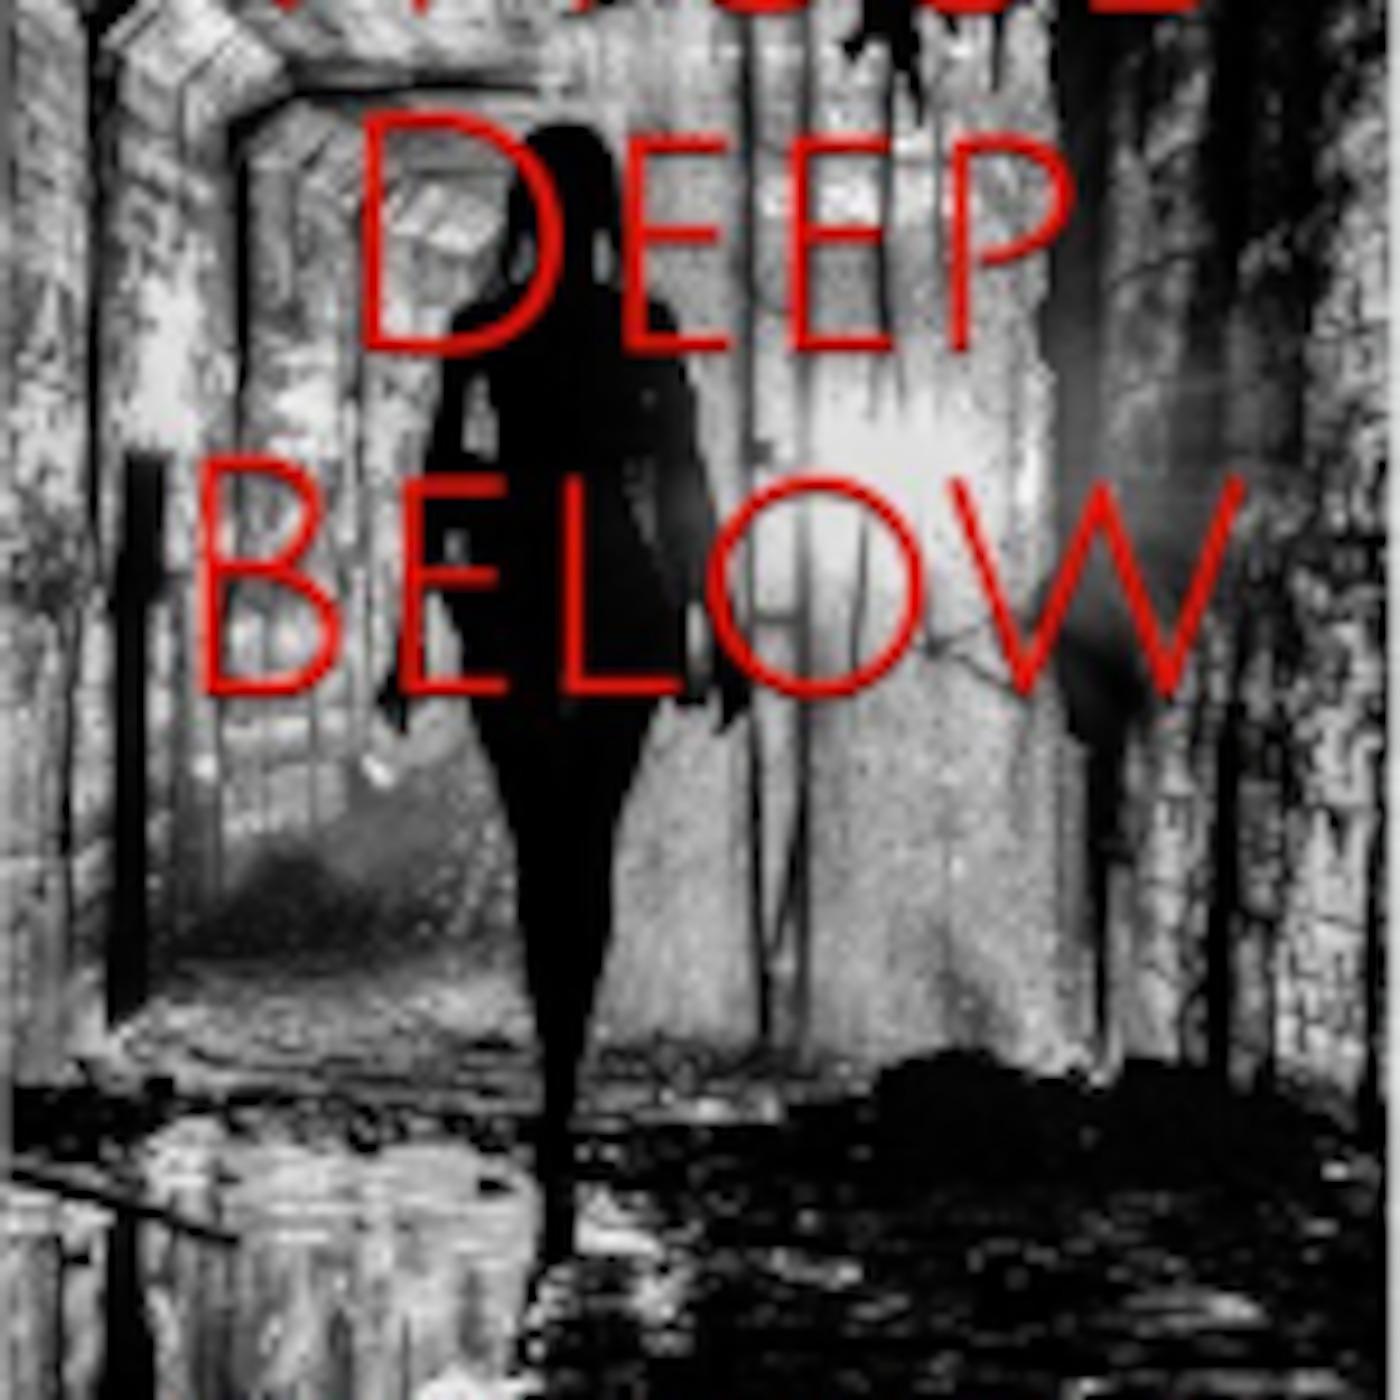 Those Deep Below, by author John W. Noyes